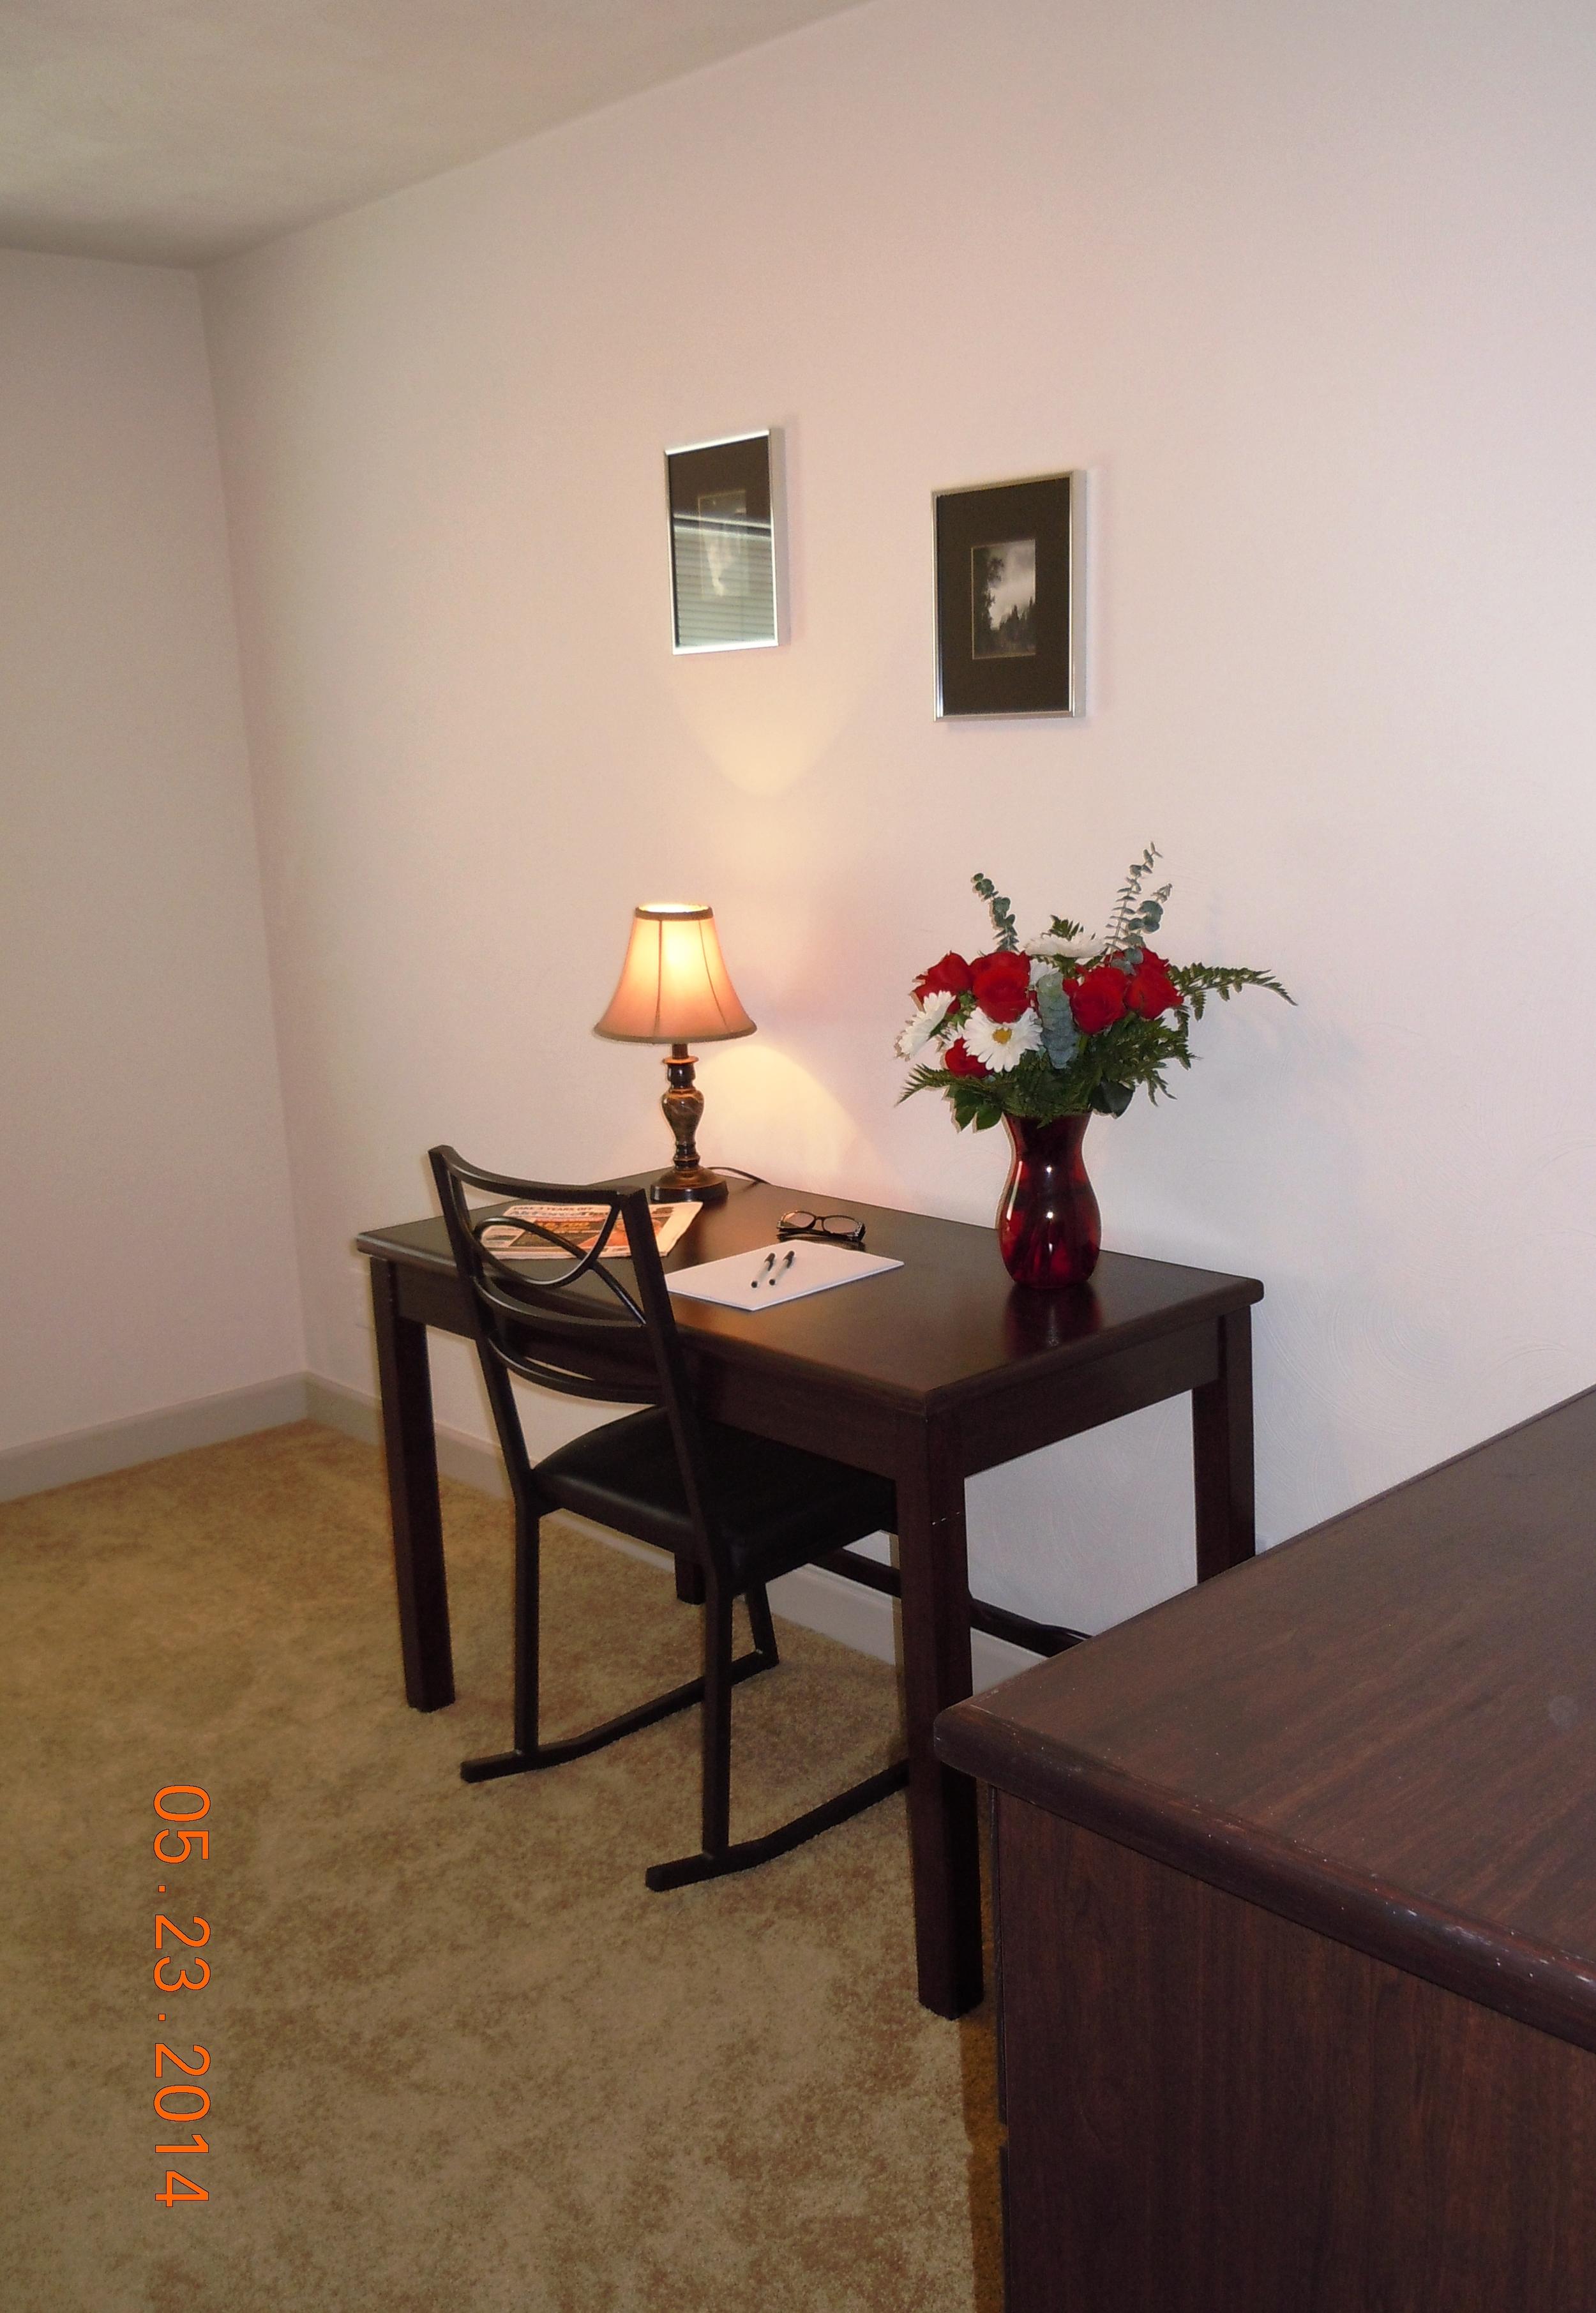 Apartment Guide Pictures (Dodi) 006.jpg